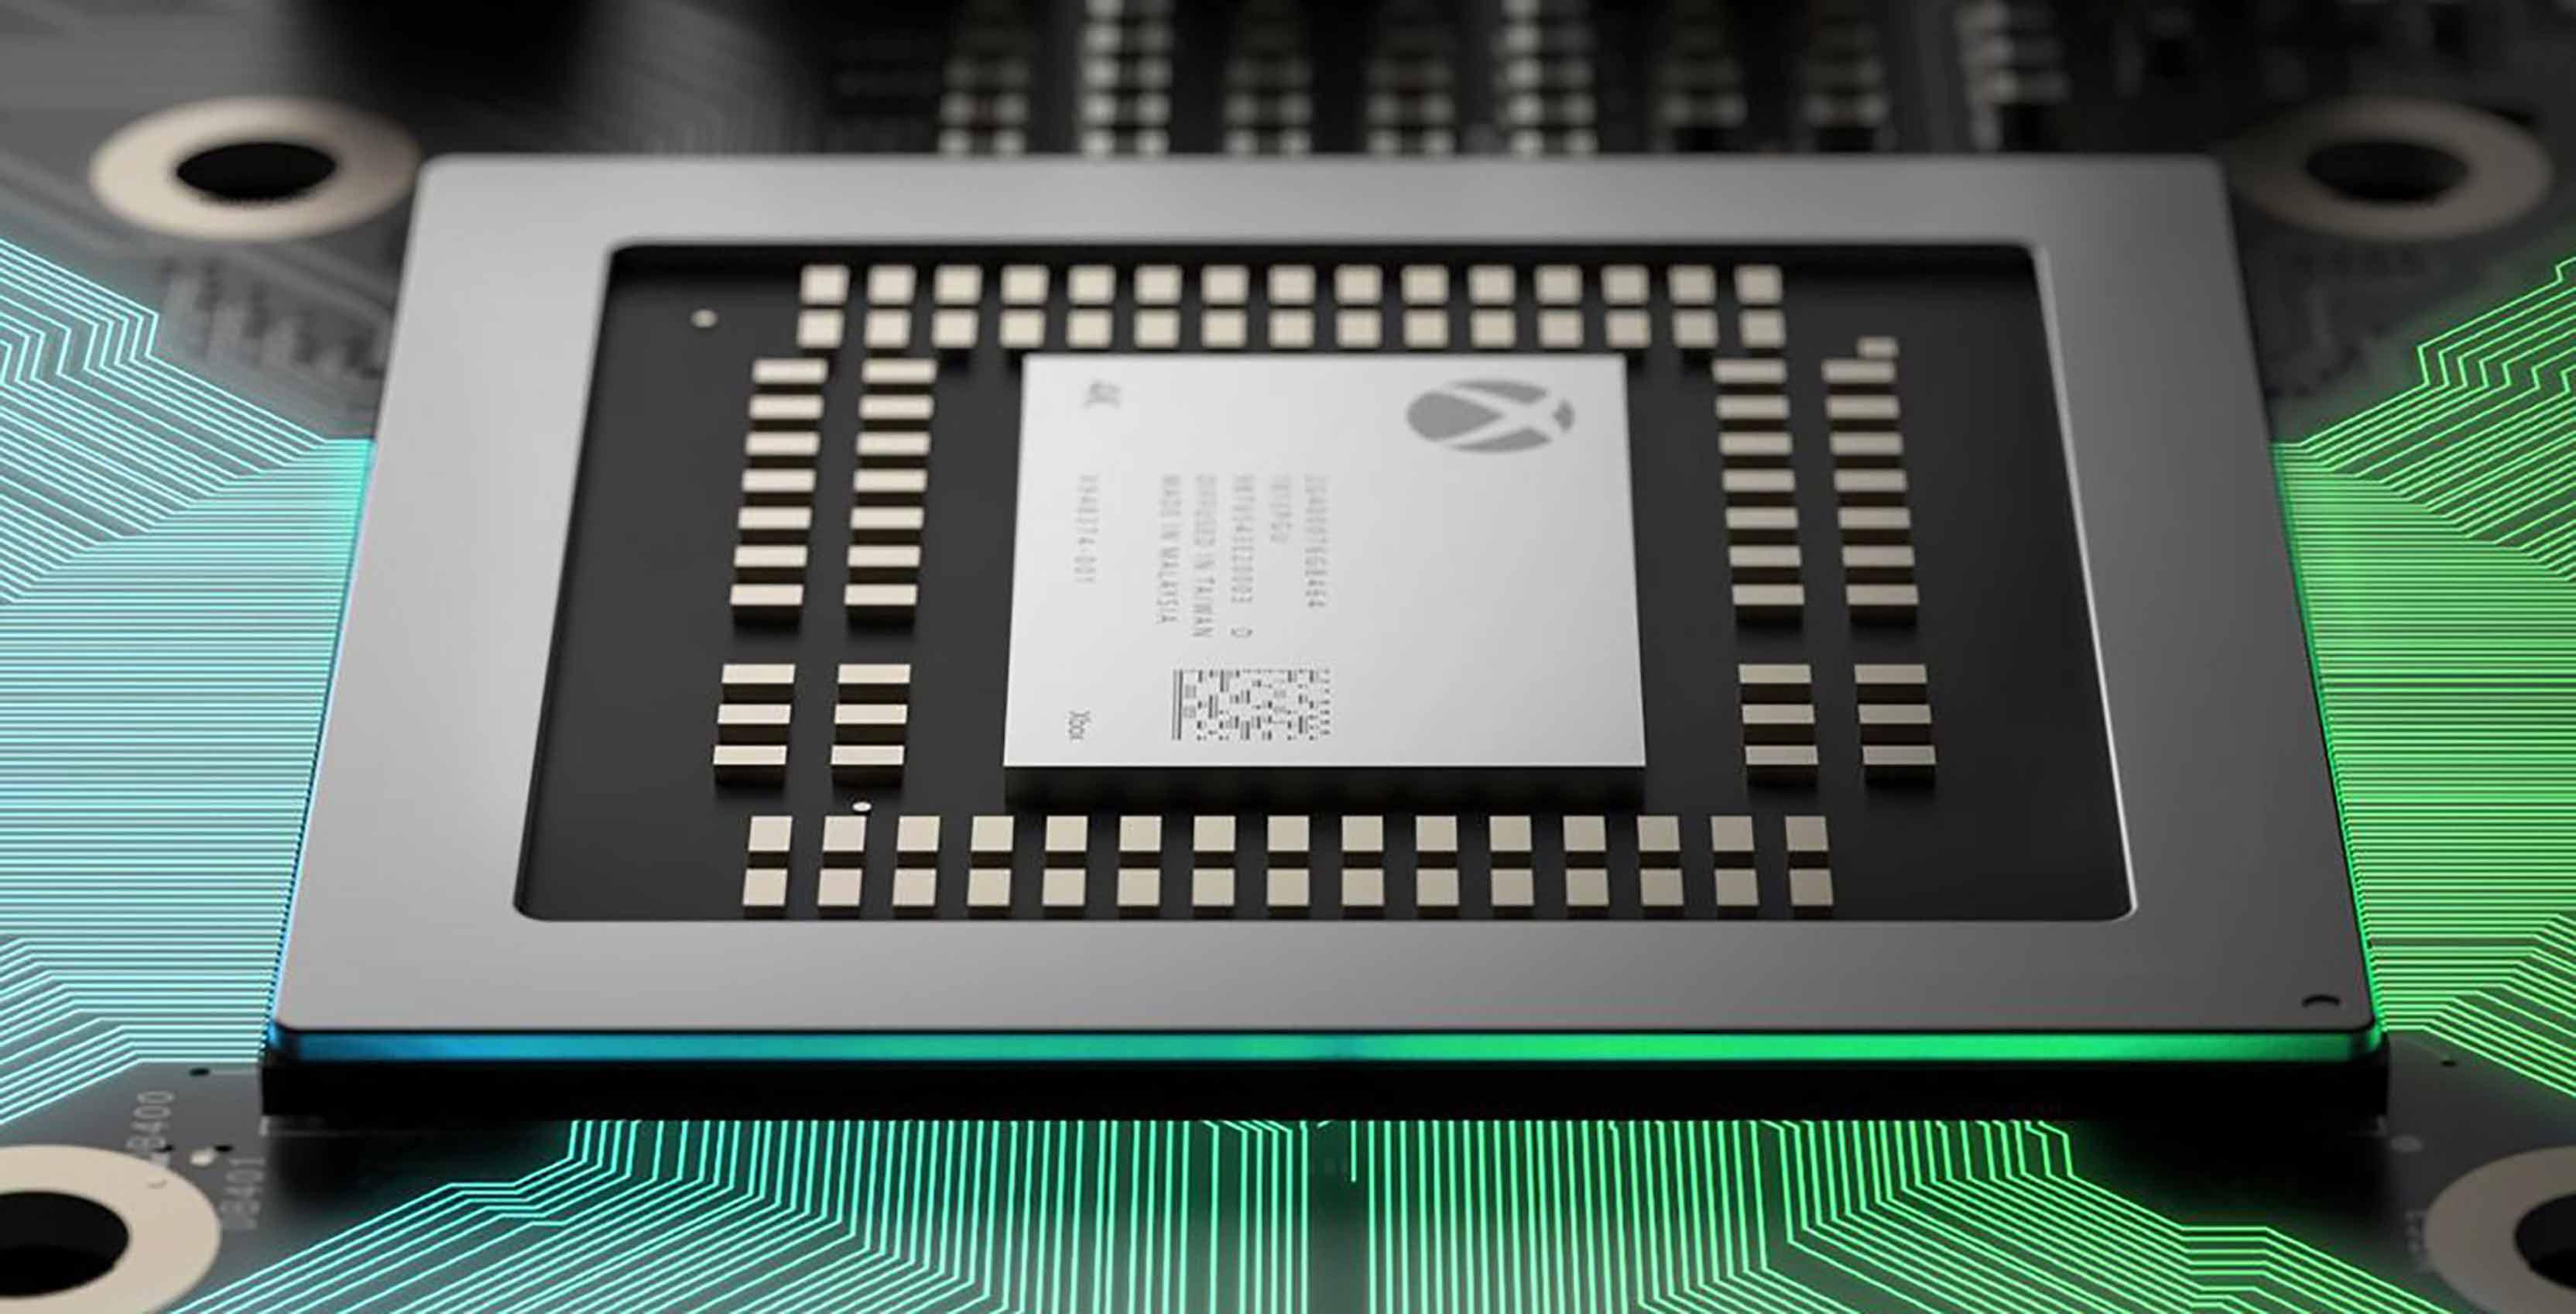 Project Scorpio chip with Xbox logo